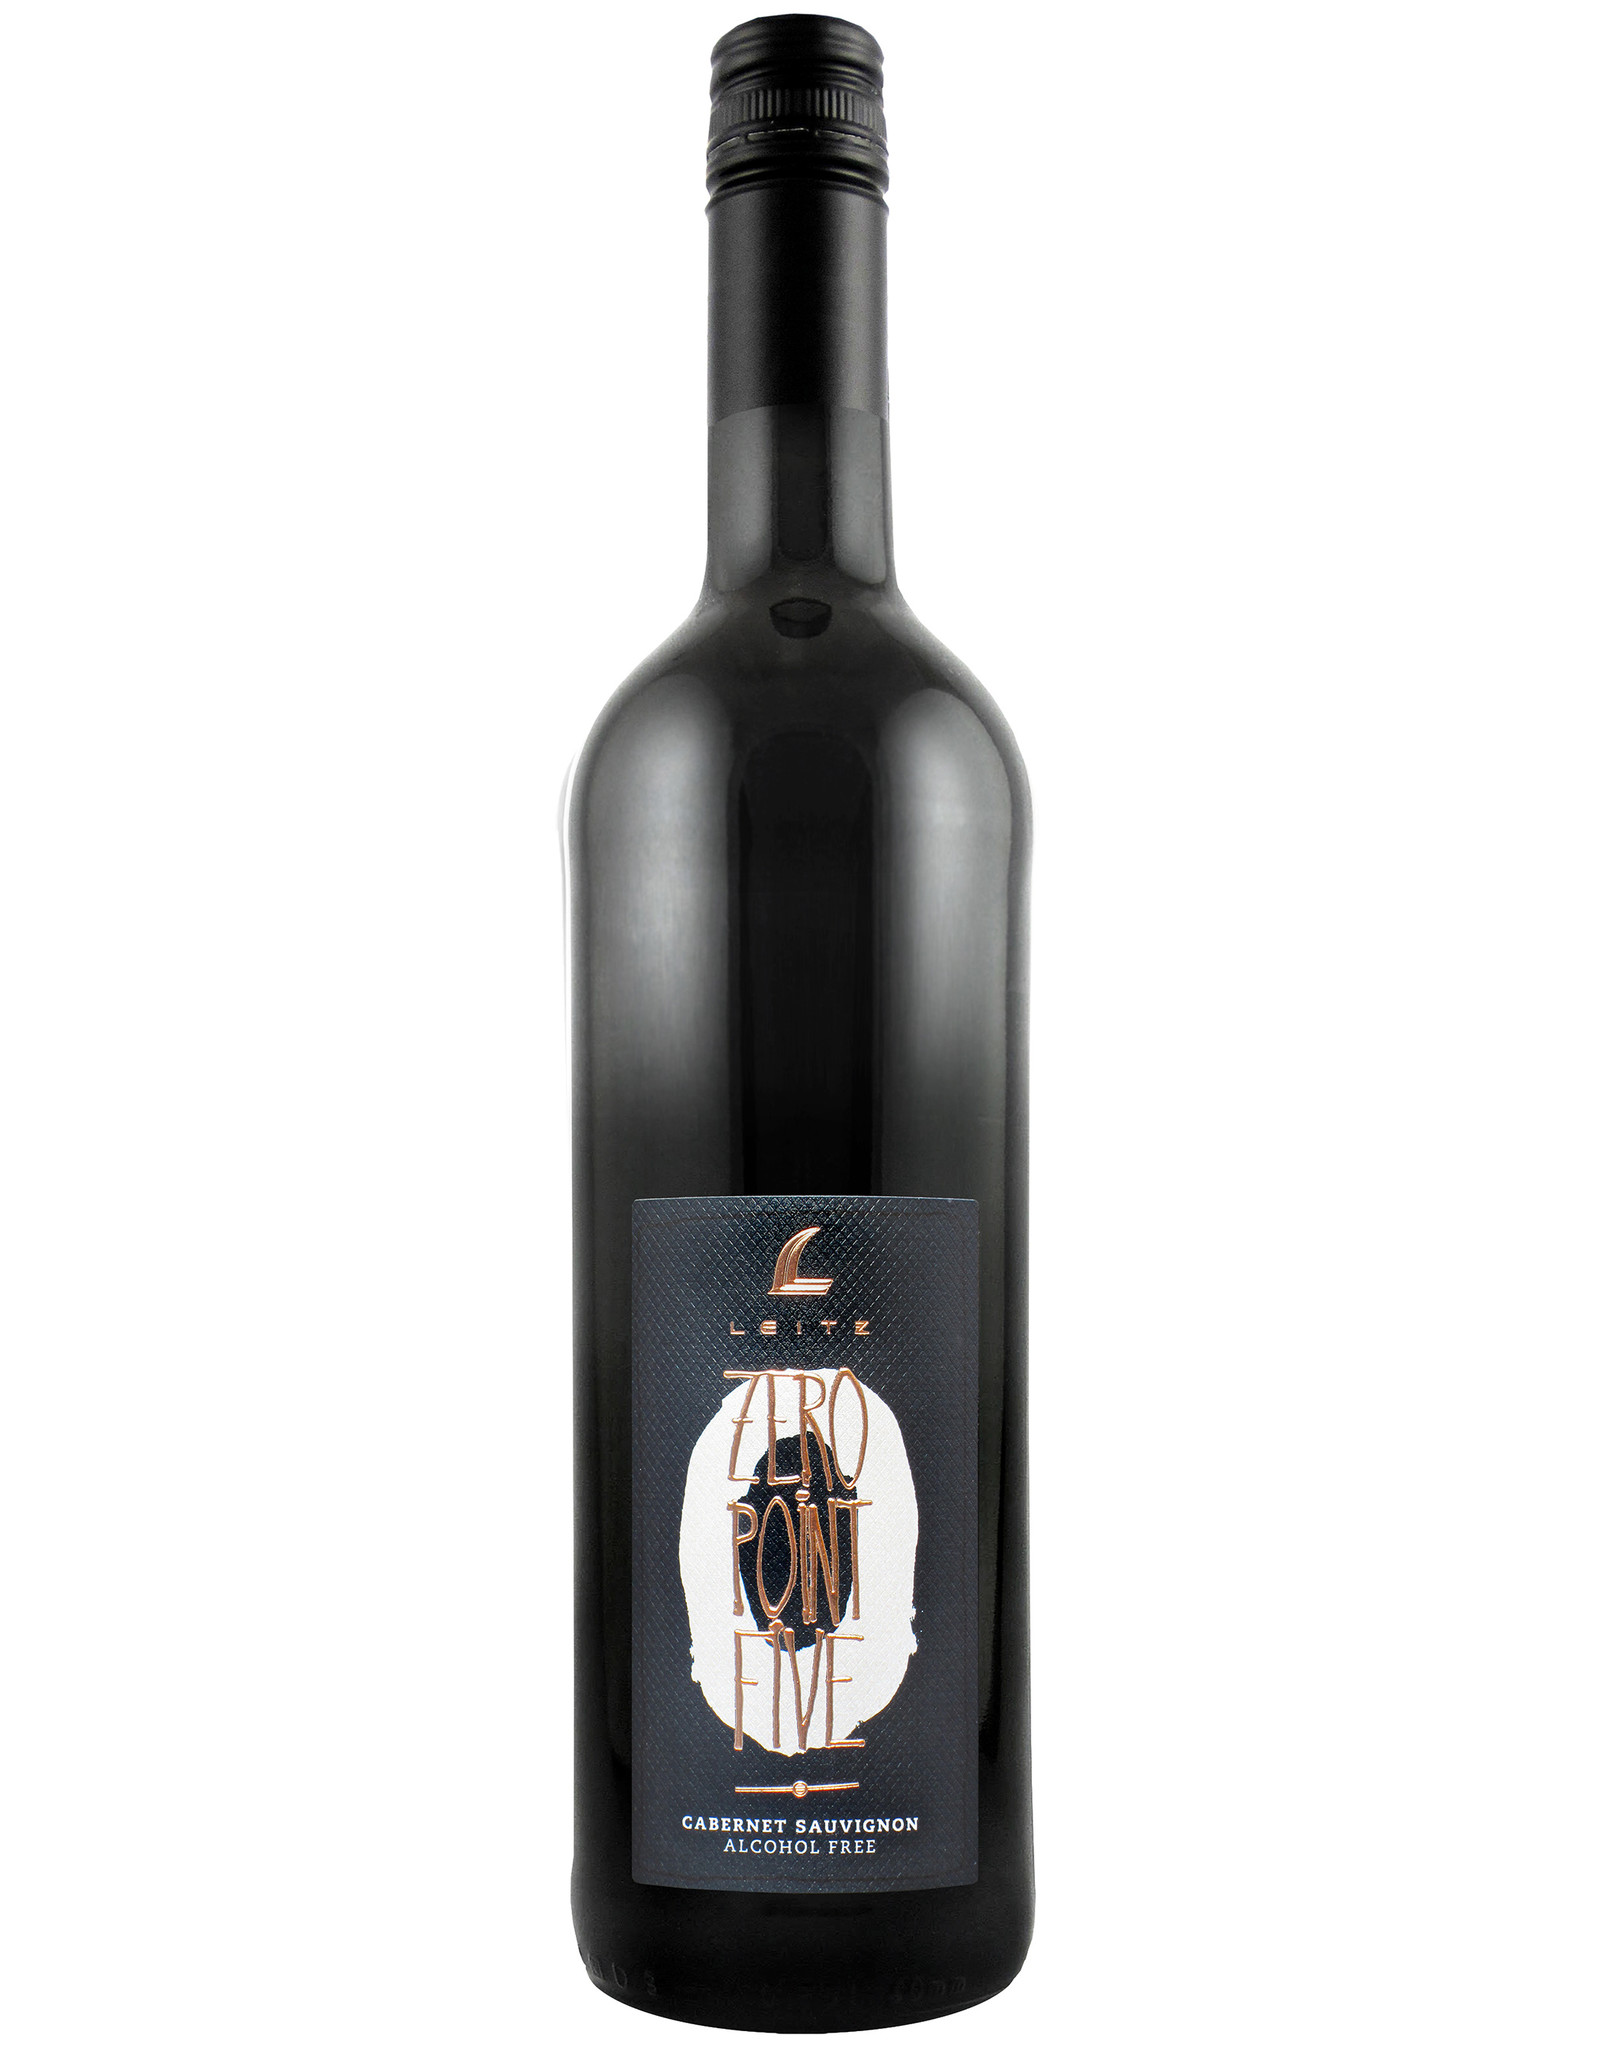 Weingut Leitz Zero-Point-Five Cabernet Sauvignon 0,5%